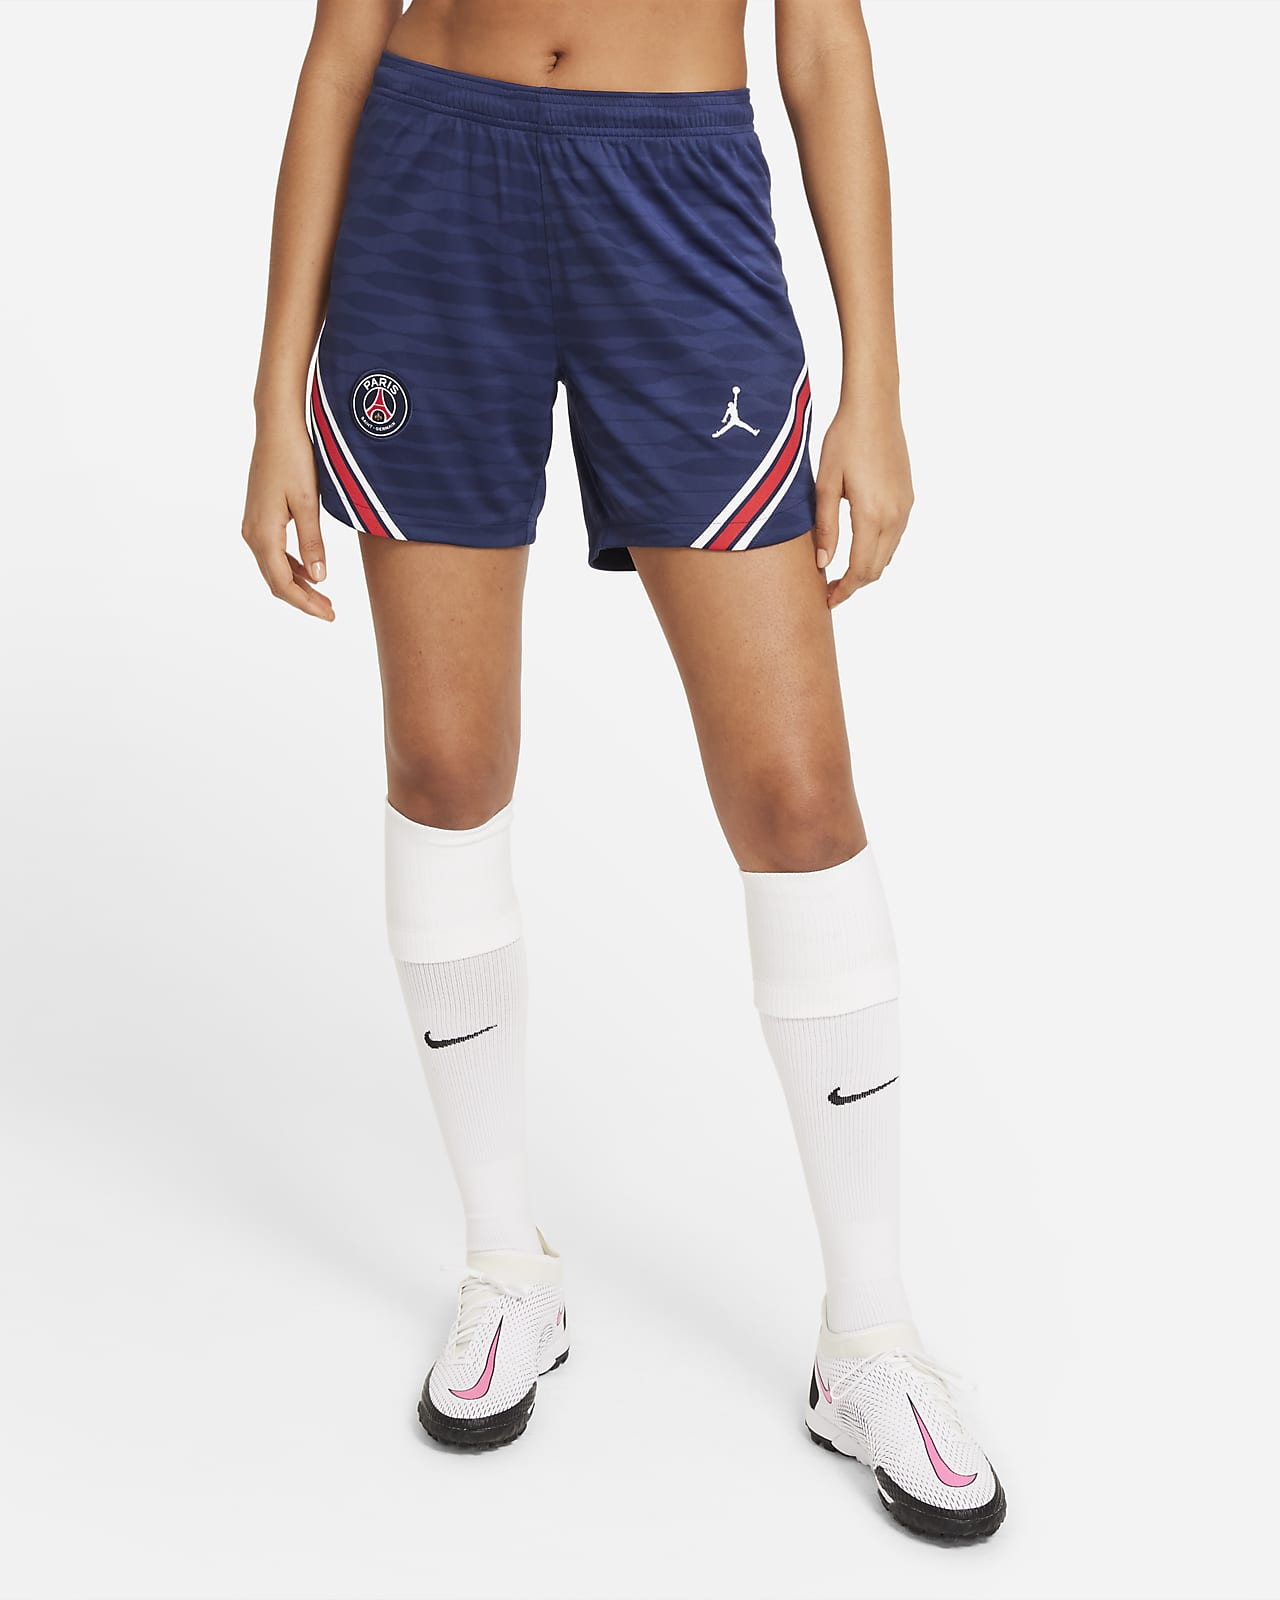 Paris Saint-Germain Strike Women's Nike Dri-FIT Football Shorts